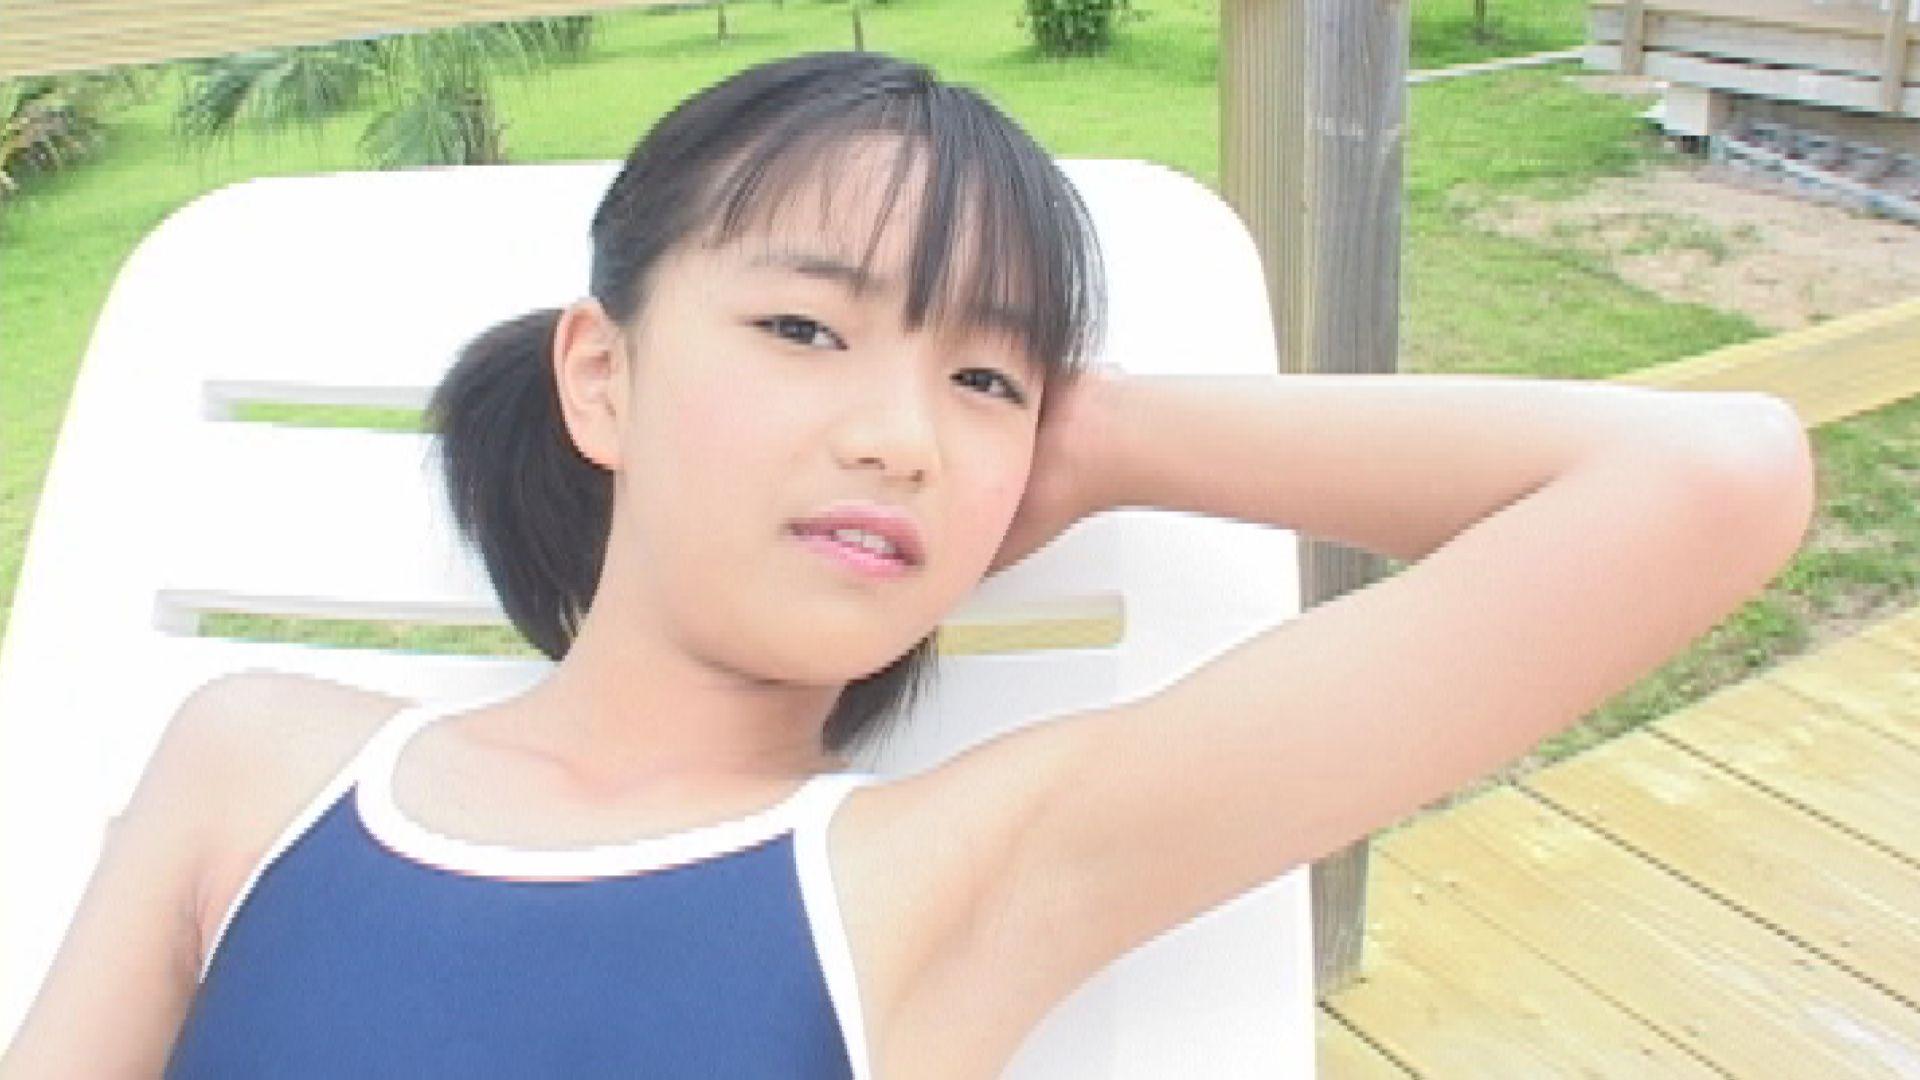 mayumi vol.2 / まゆみ 7